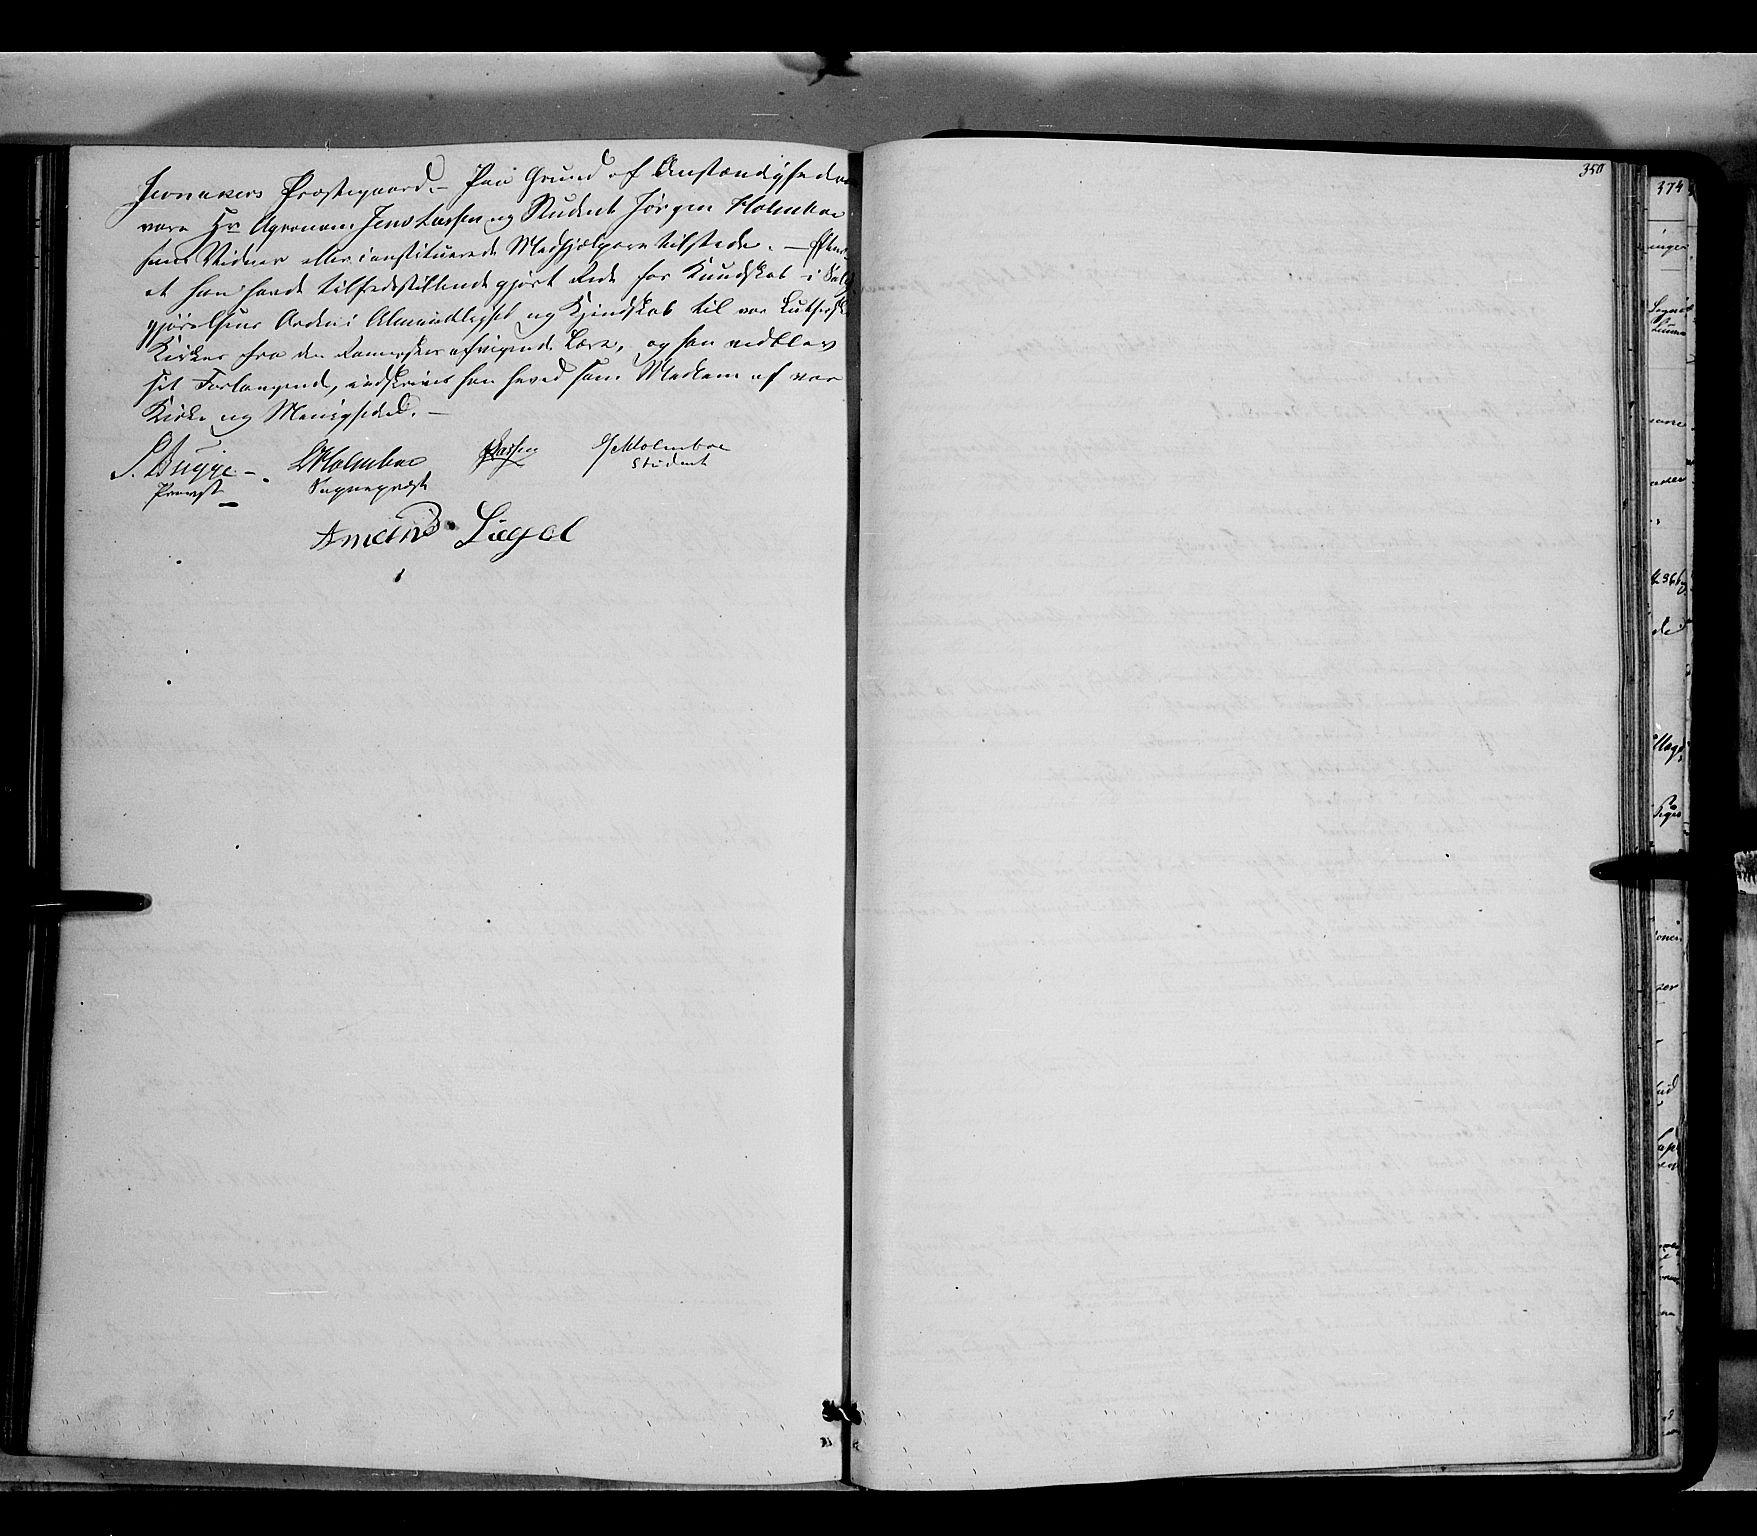 SAH, Jevnaker prestekontor, Ministerialbok nr. 7, 1858-1876, s. 350